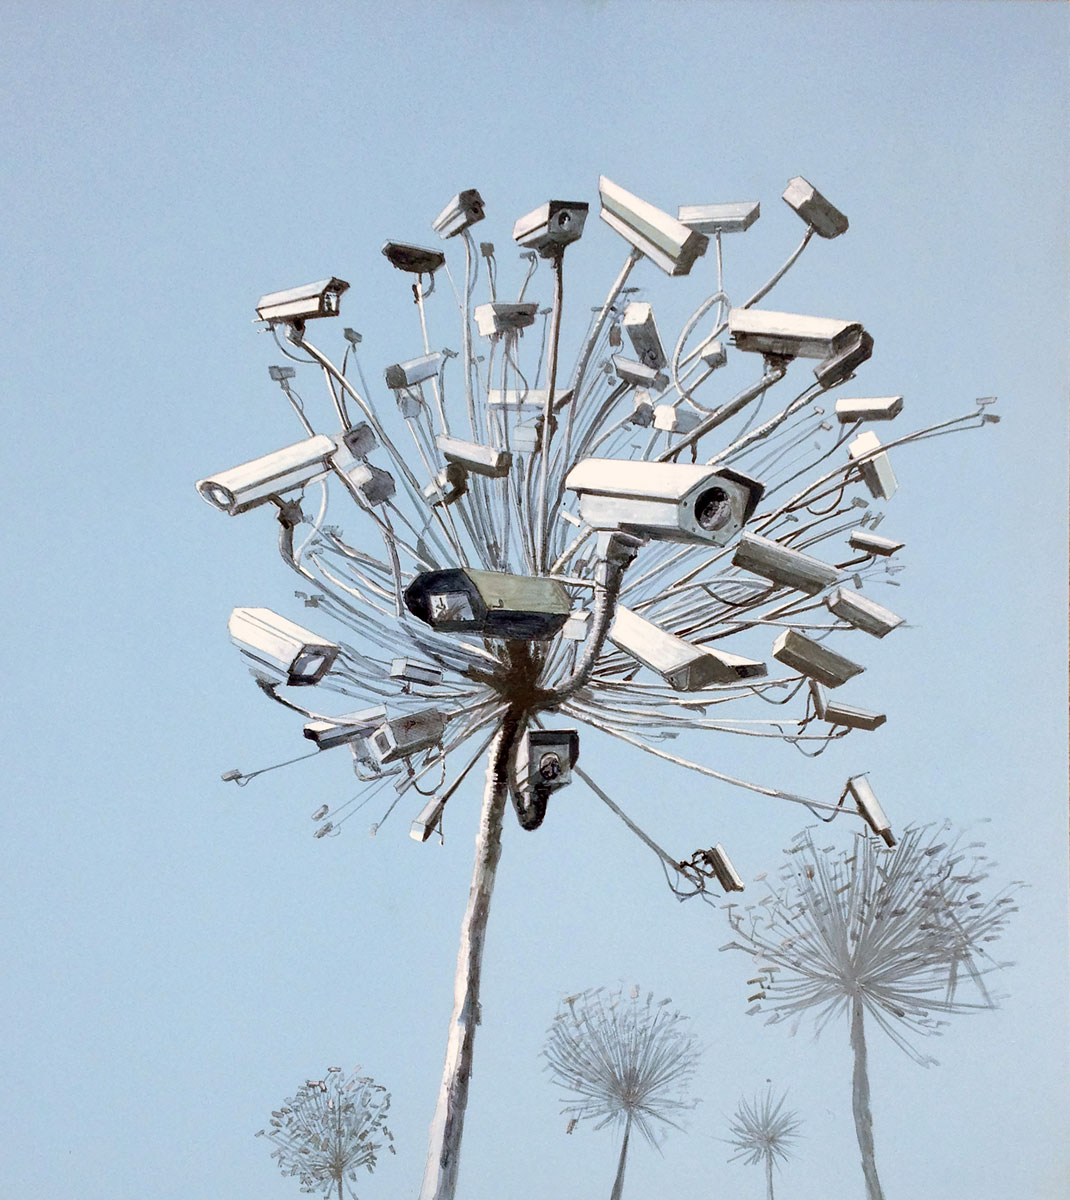 Untitled (Tree Cameras 2)